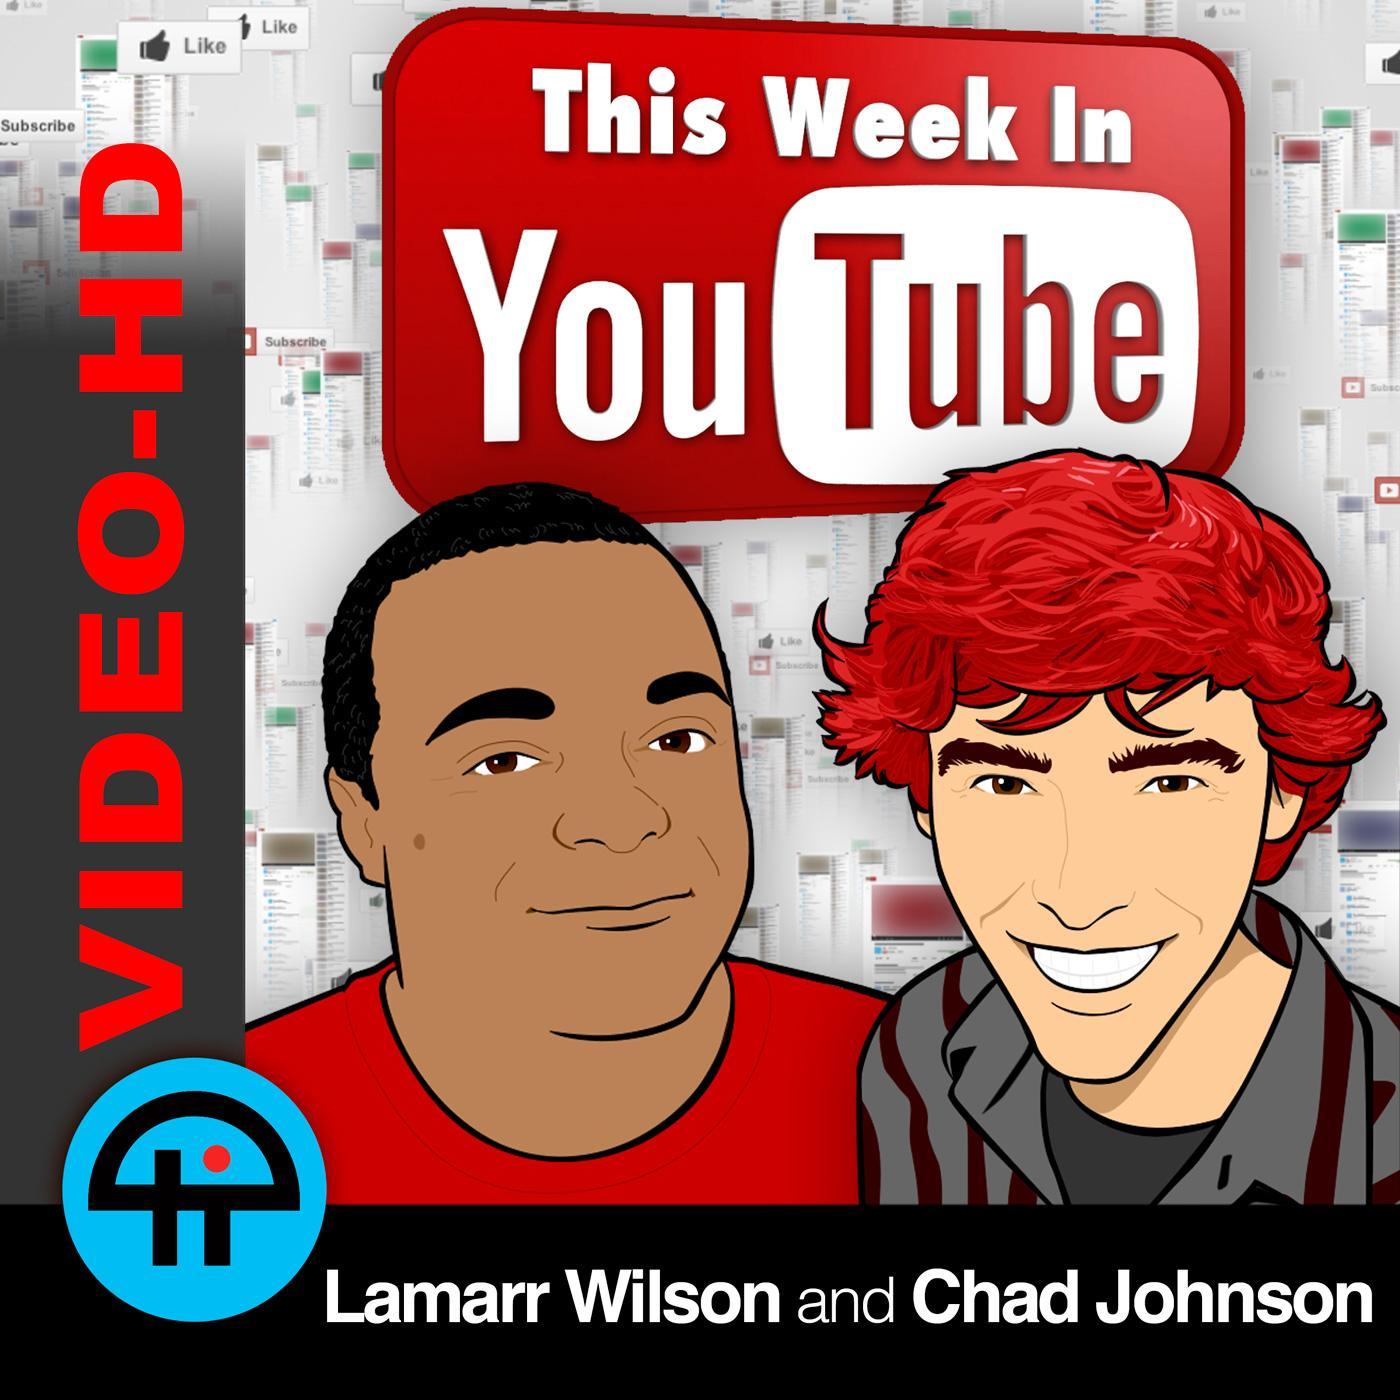 This Week in YouTube (Video HD)